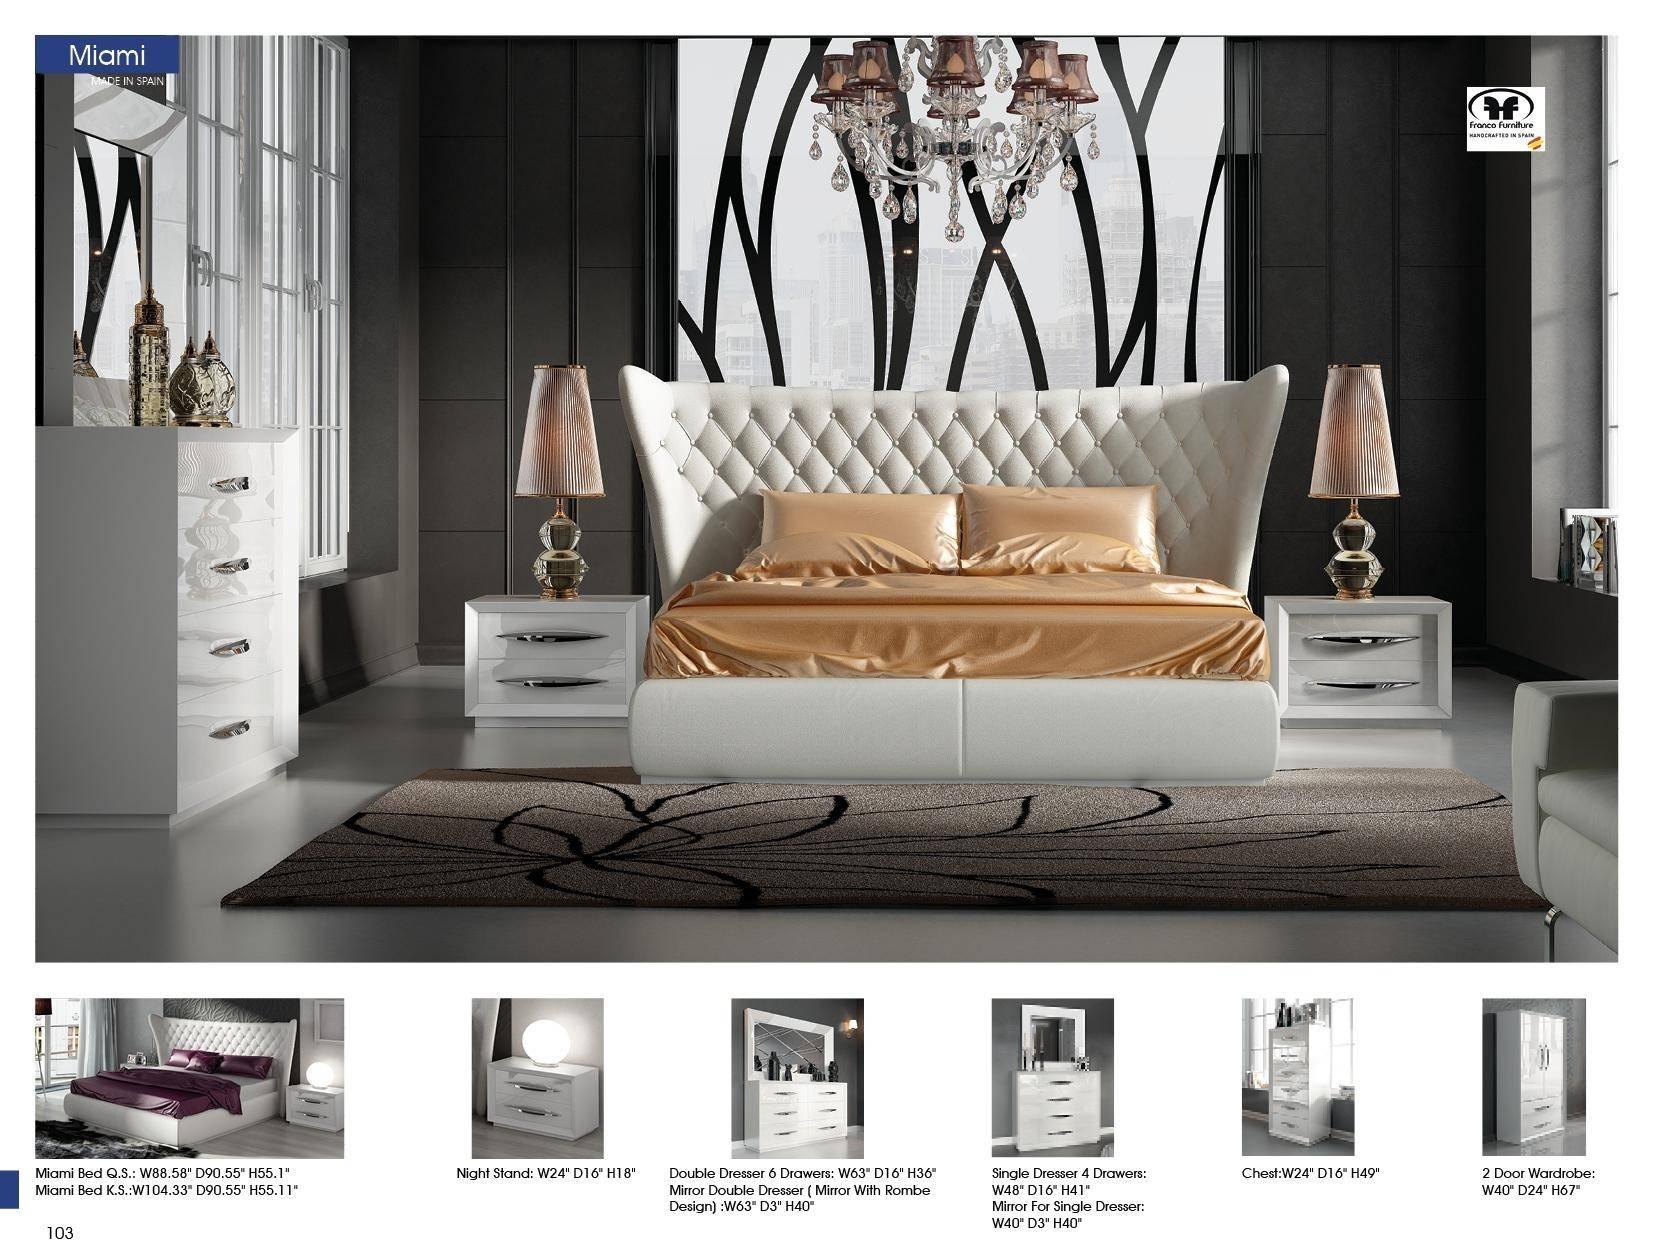 esf miami carmen queen platform bedroom set 5 pcs in white eco leather